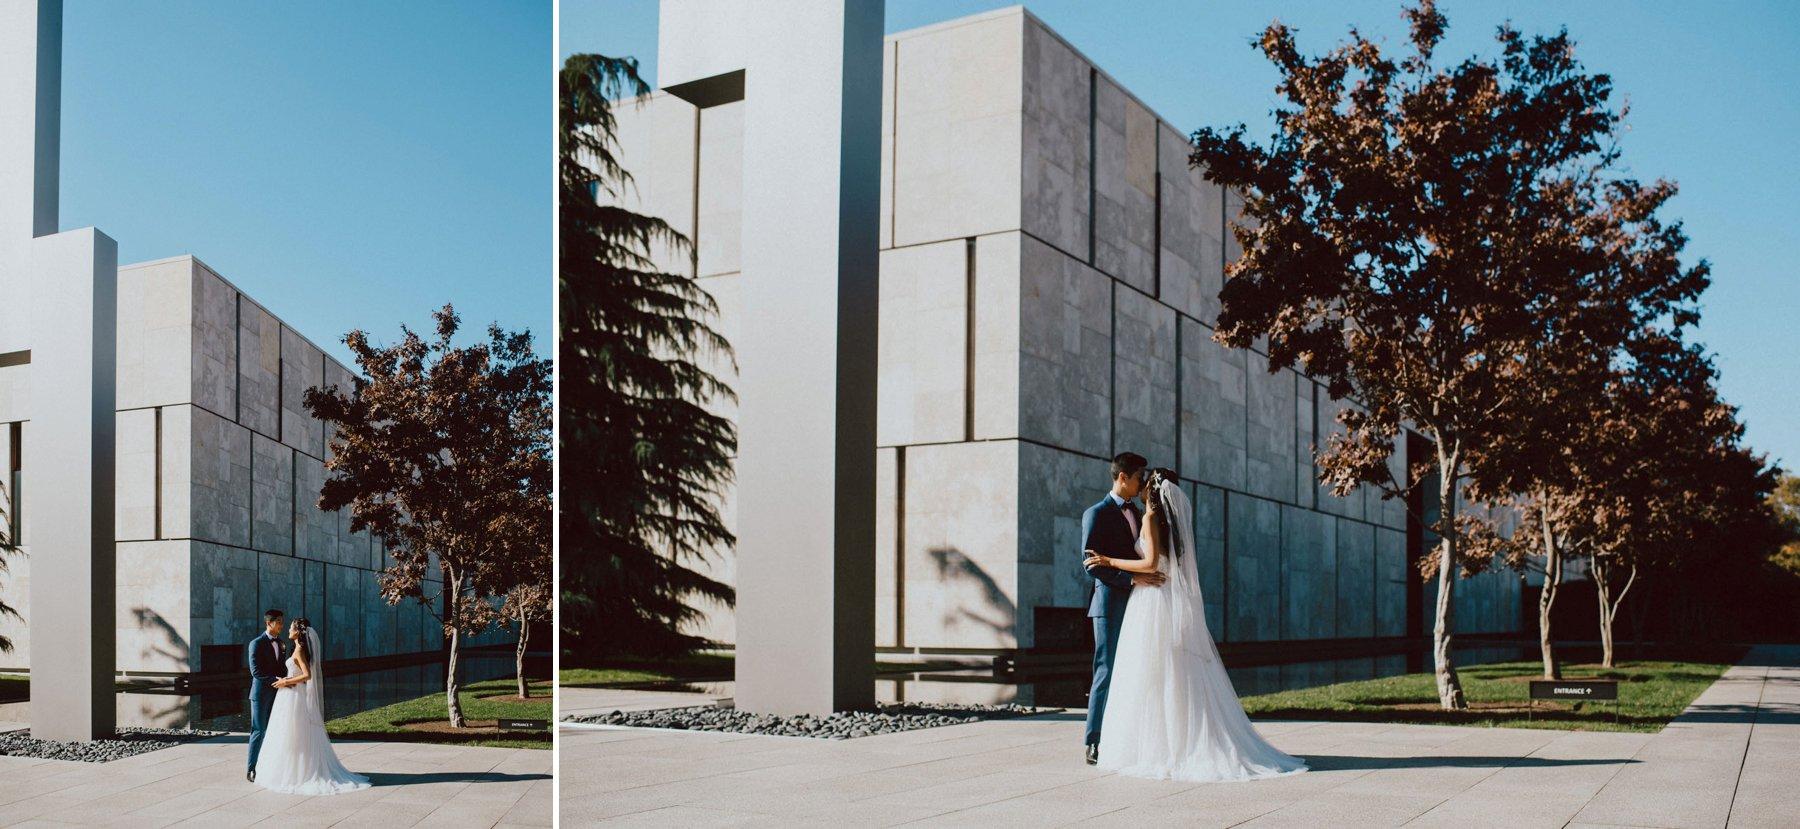 philadelphia-wedding-photographer-88.jpg